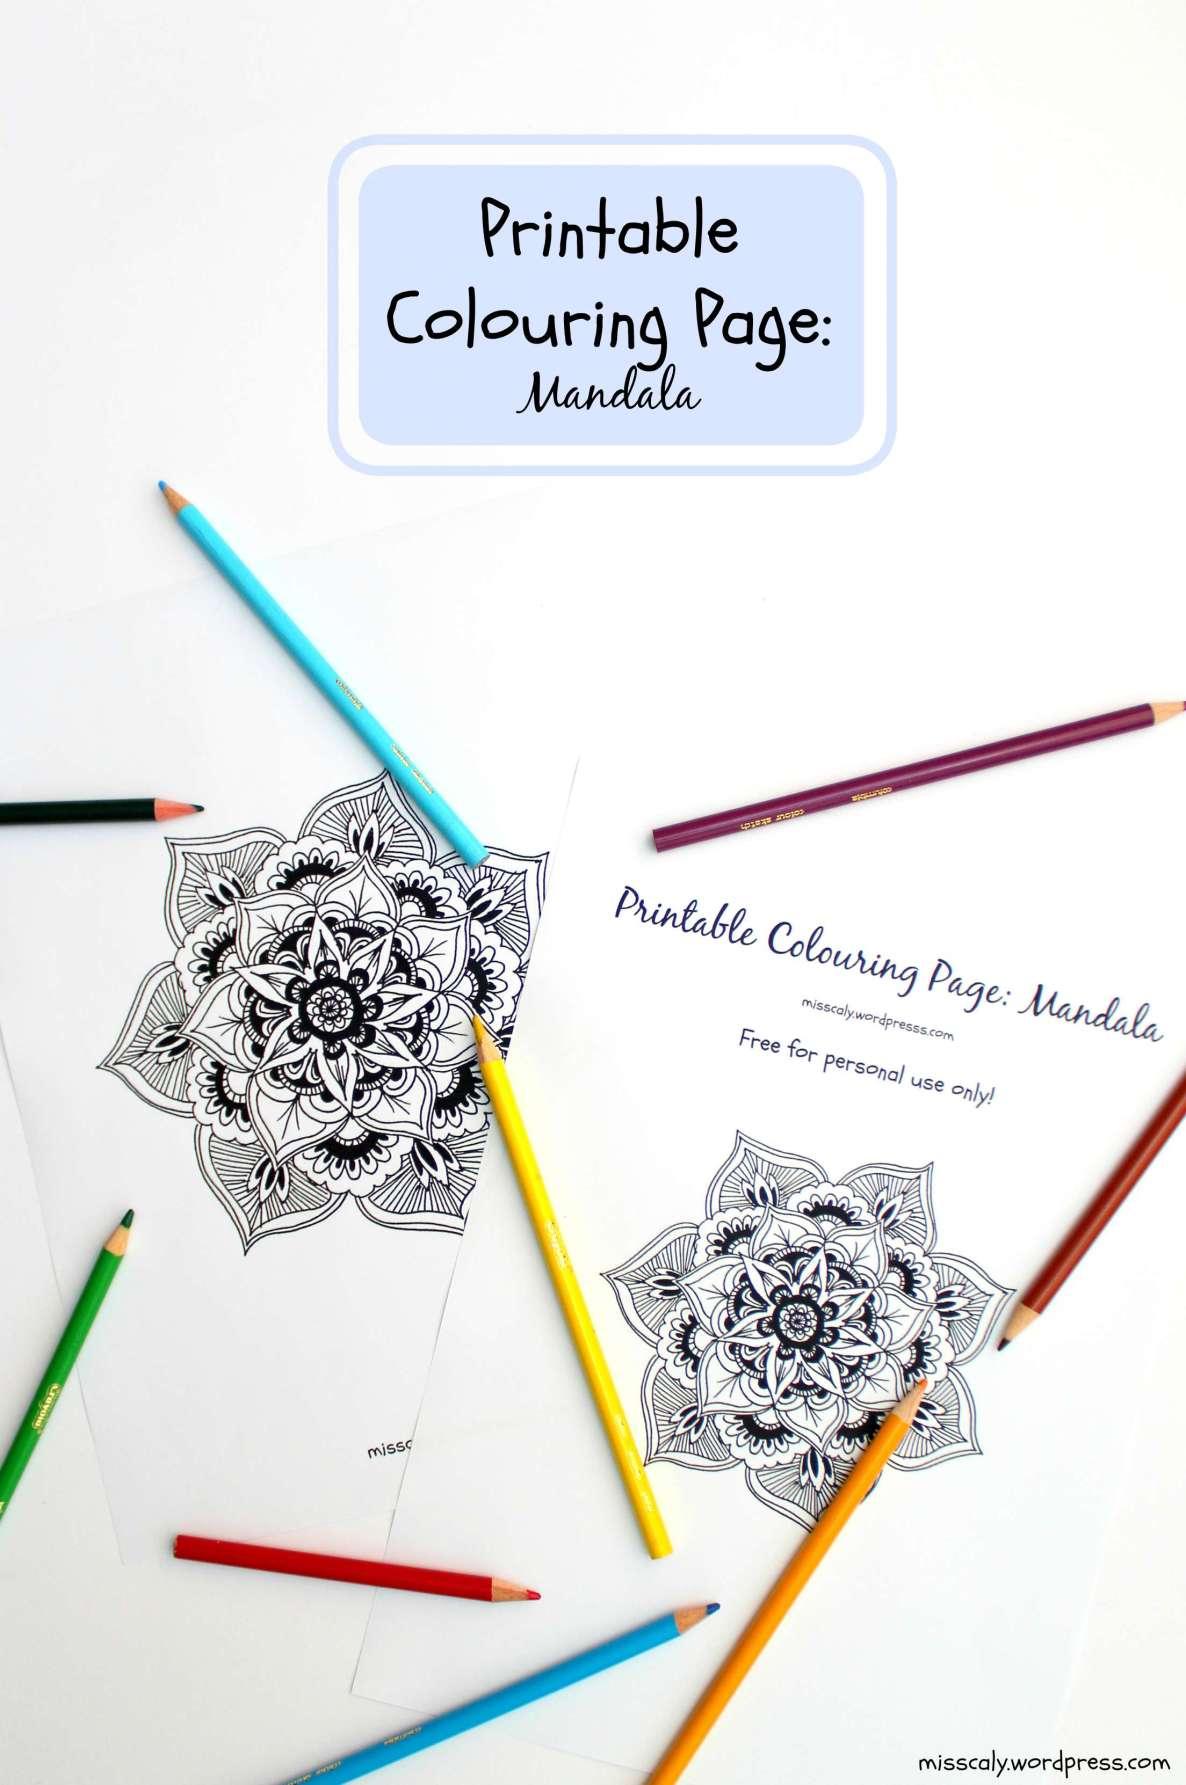 Printable Mandala colouring